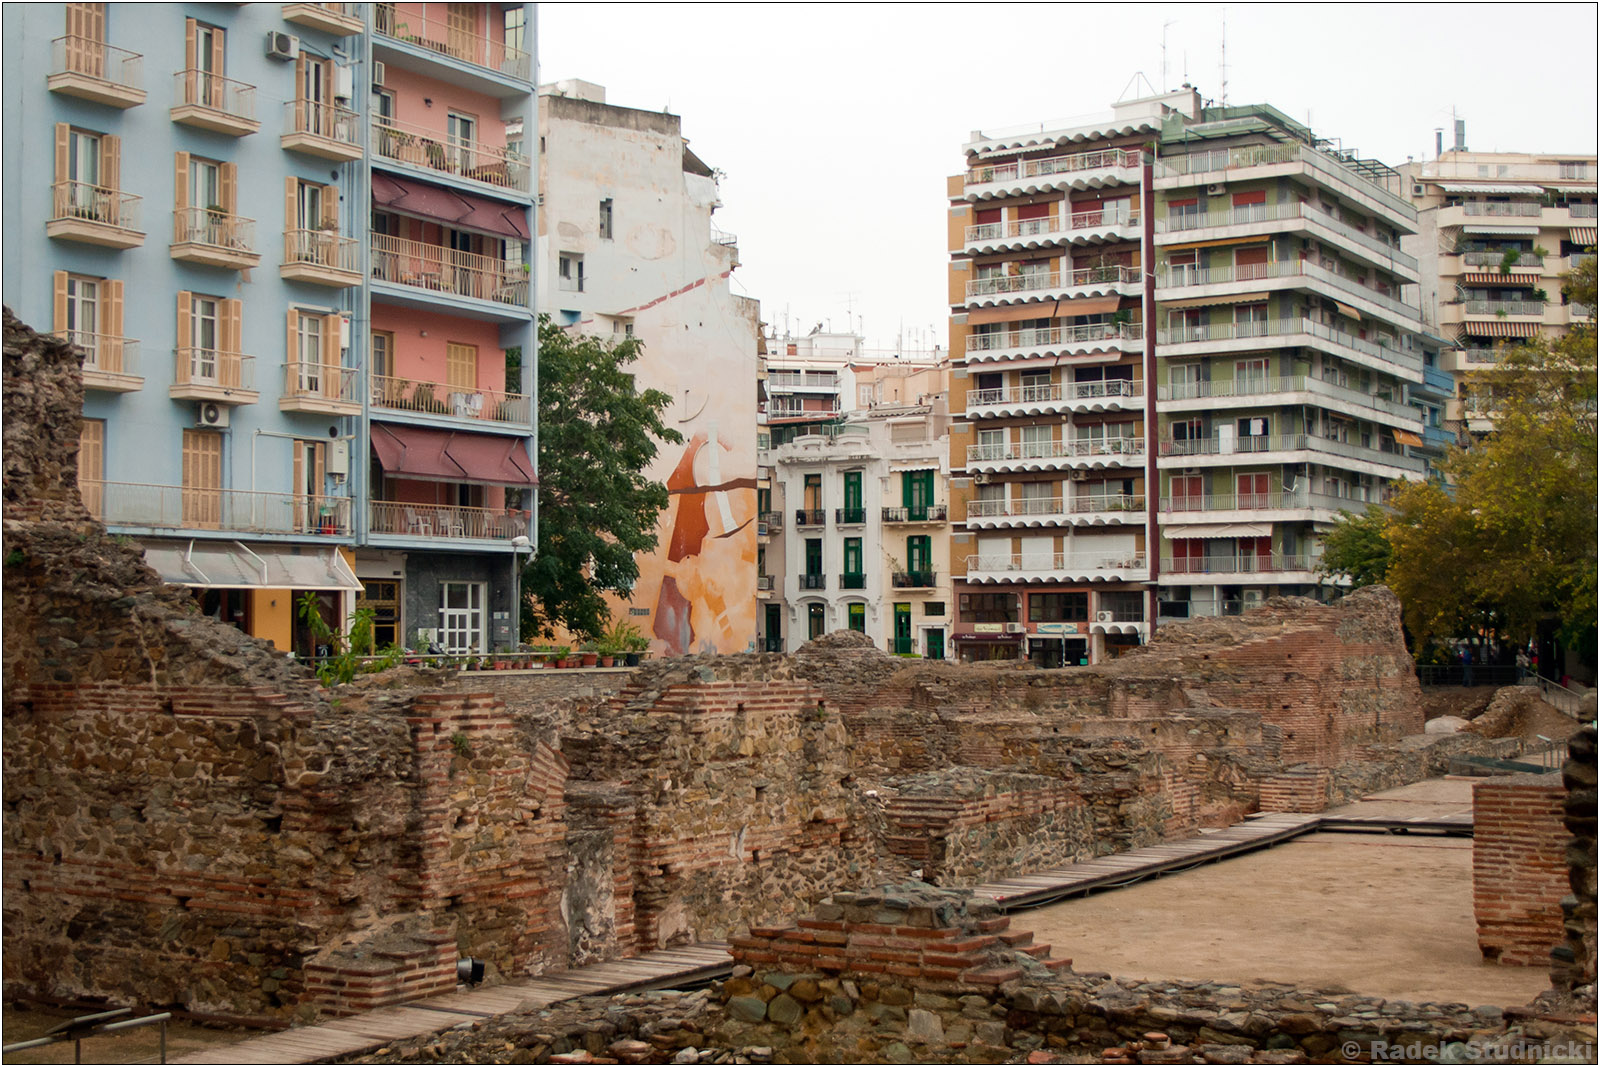 Saloniki: Pałac Galeriusza pośród bloków